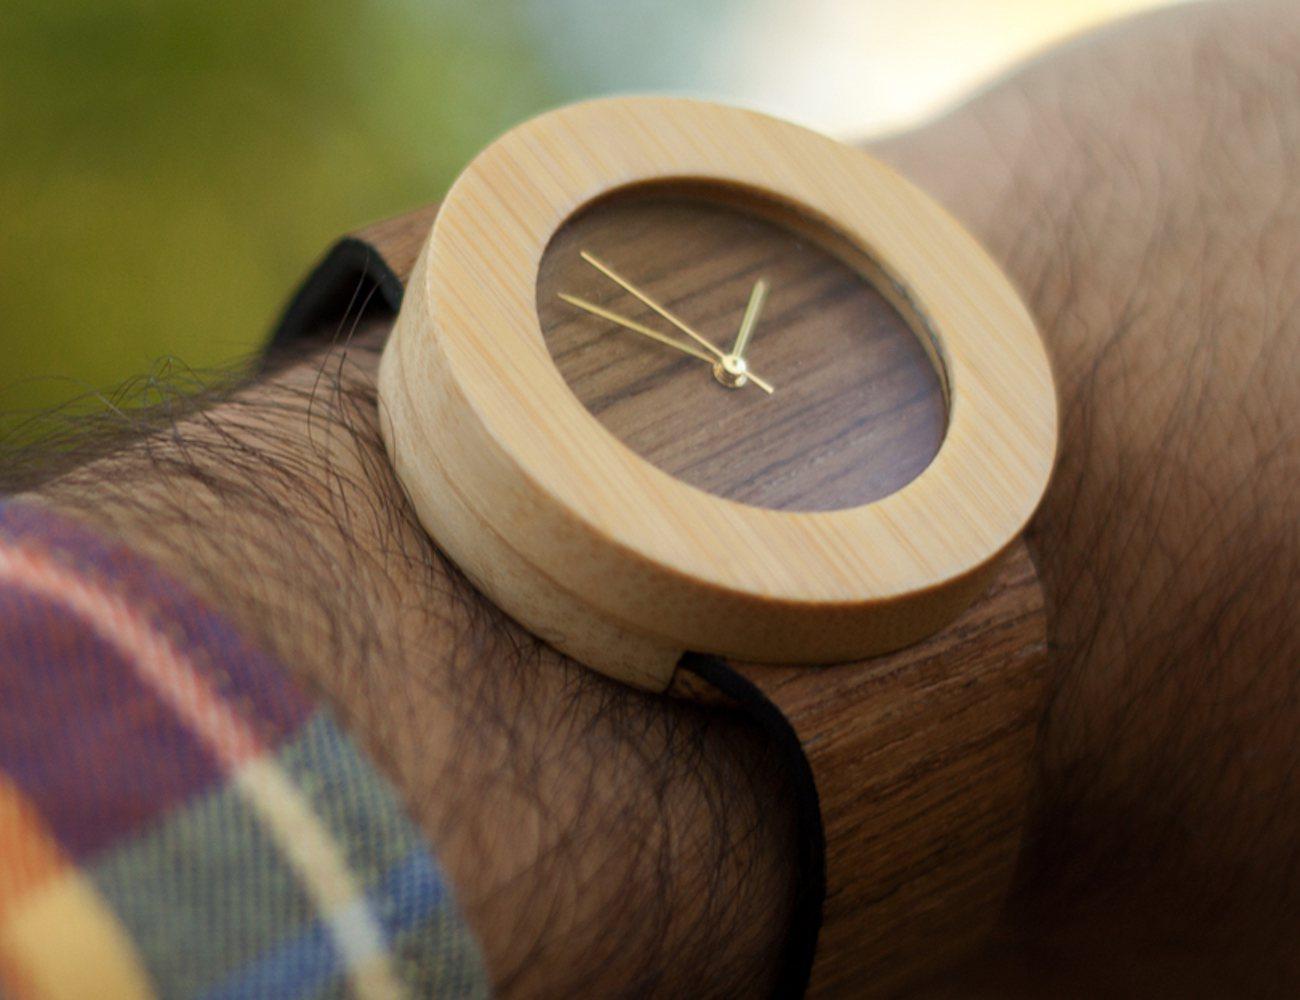 The Carpenter Watch